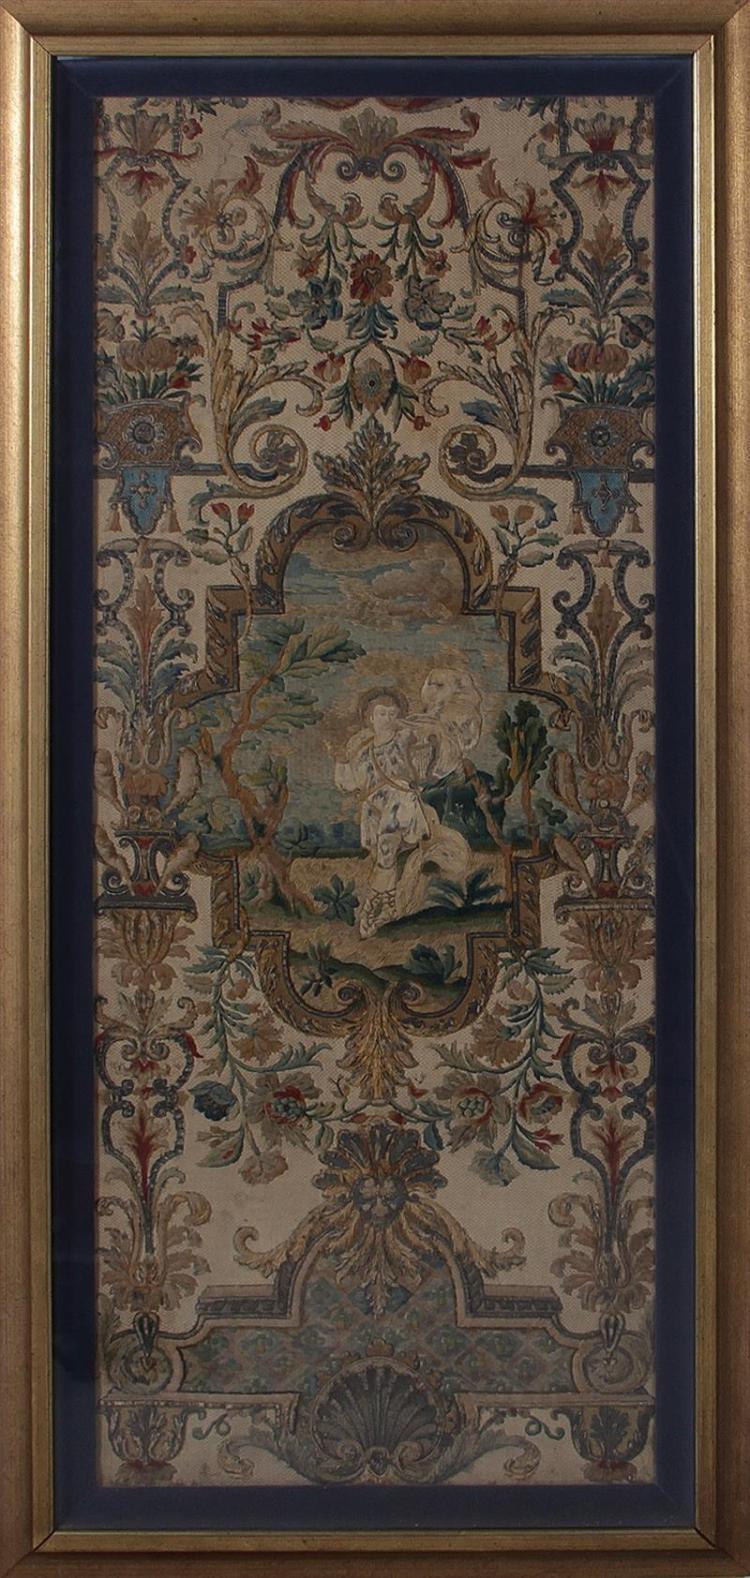 Continental framed needlework tapestries (2pcs)